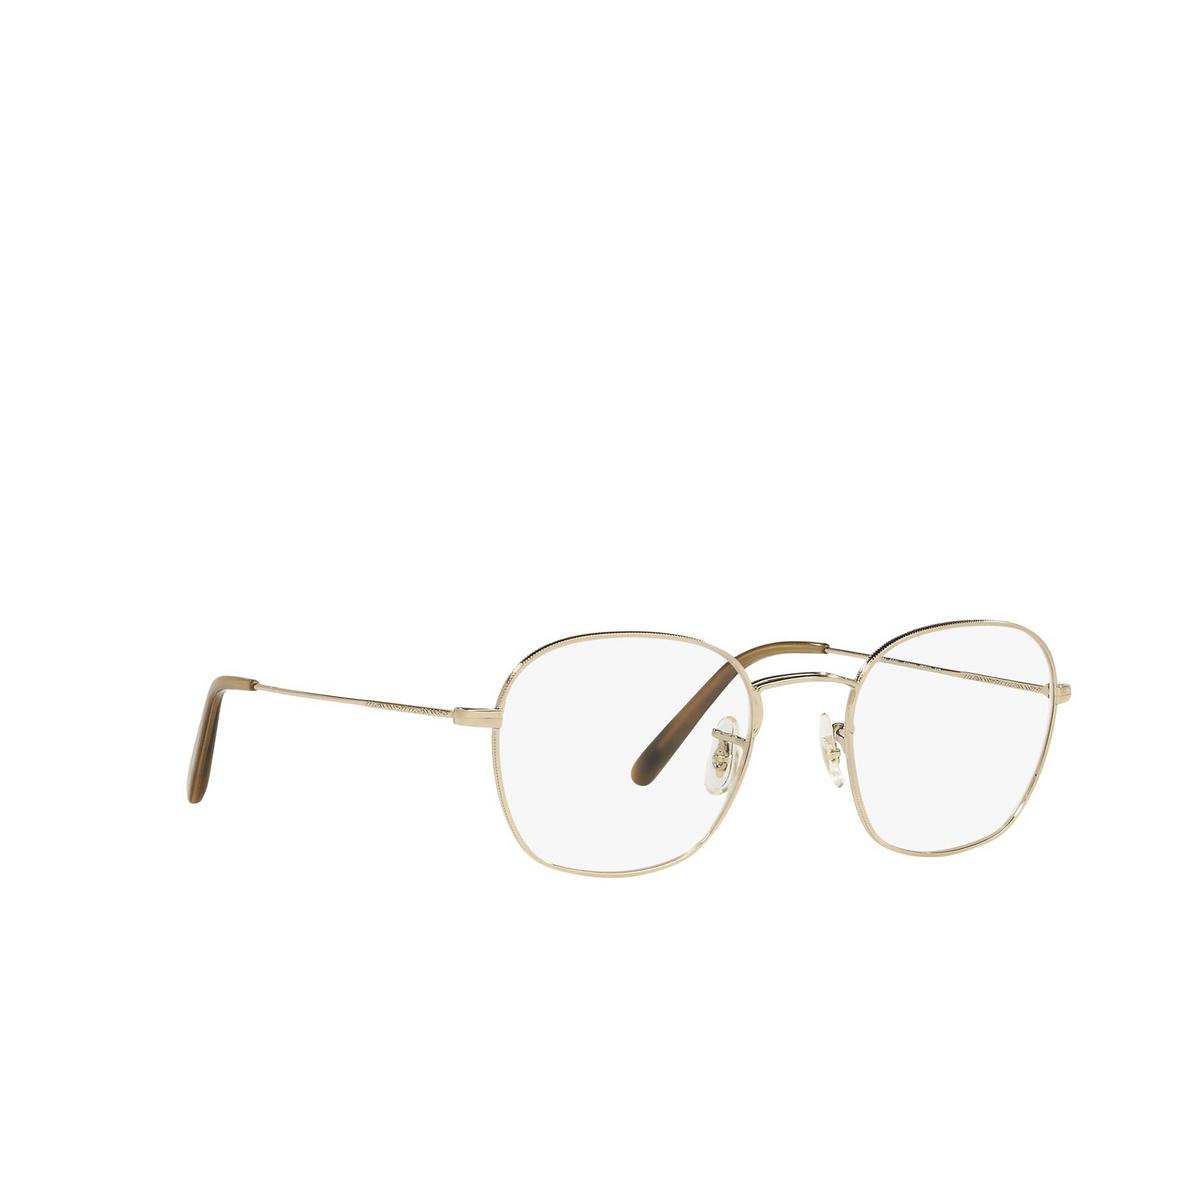 Oliver Peoples® Round Eyeglasses: Allinger OV1284 color Gold 5145 - three-quarters view.